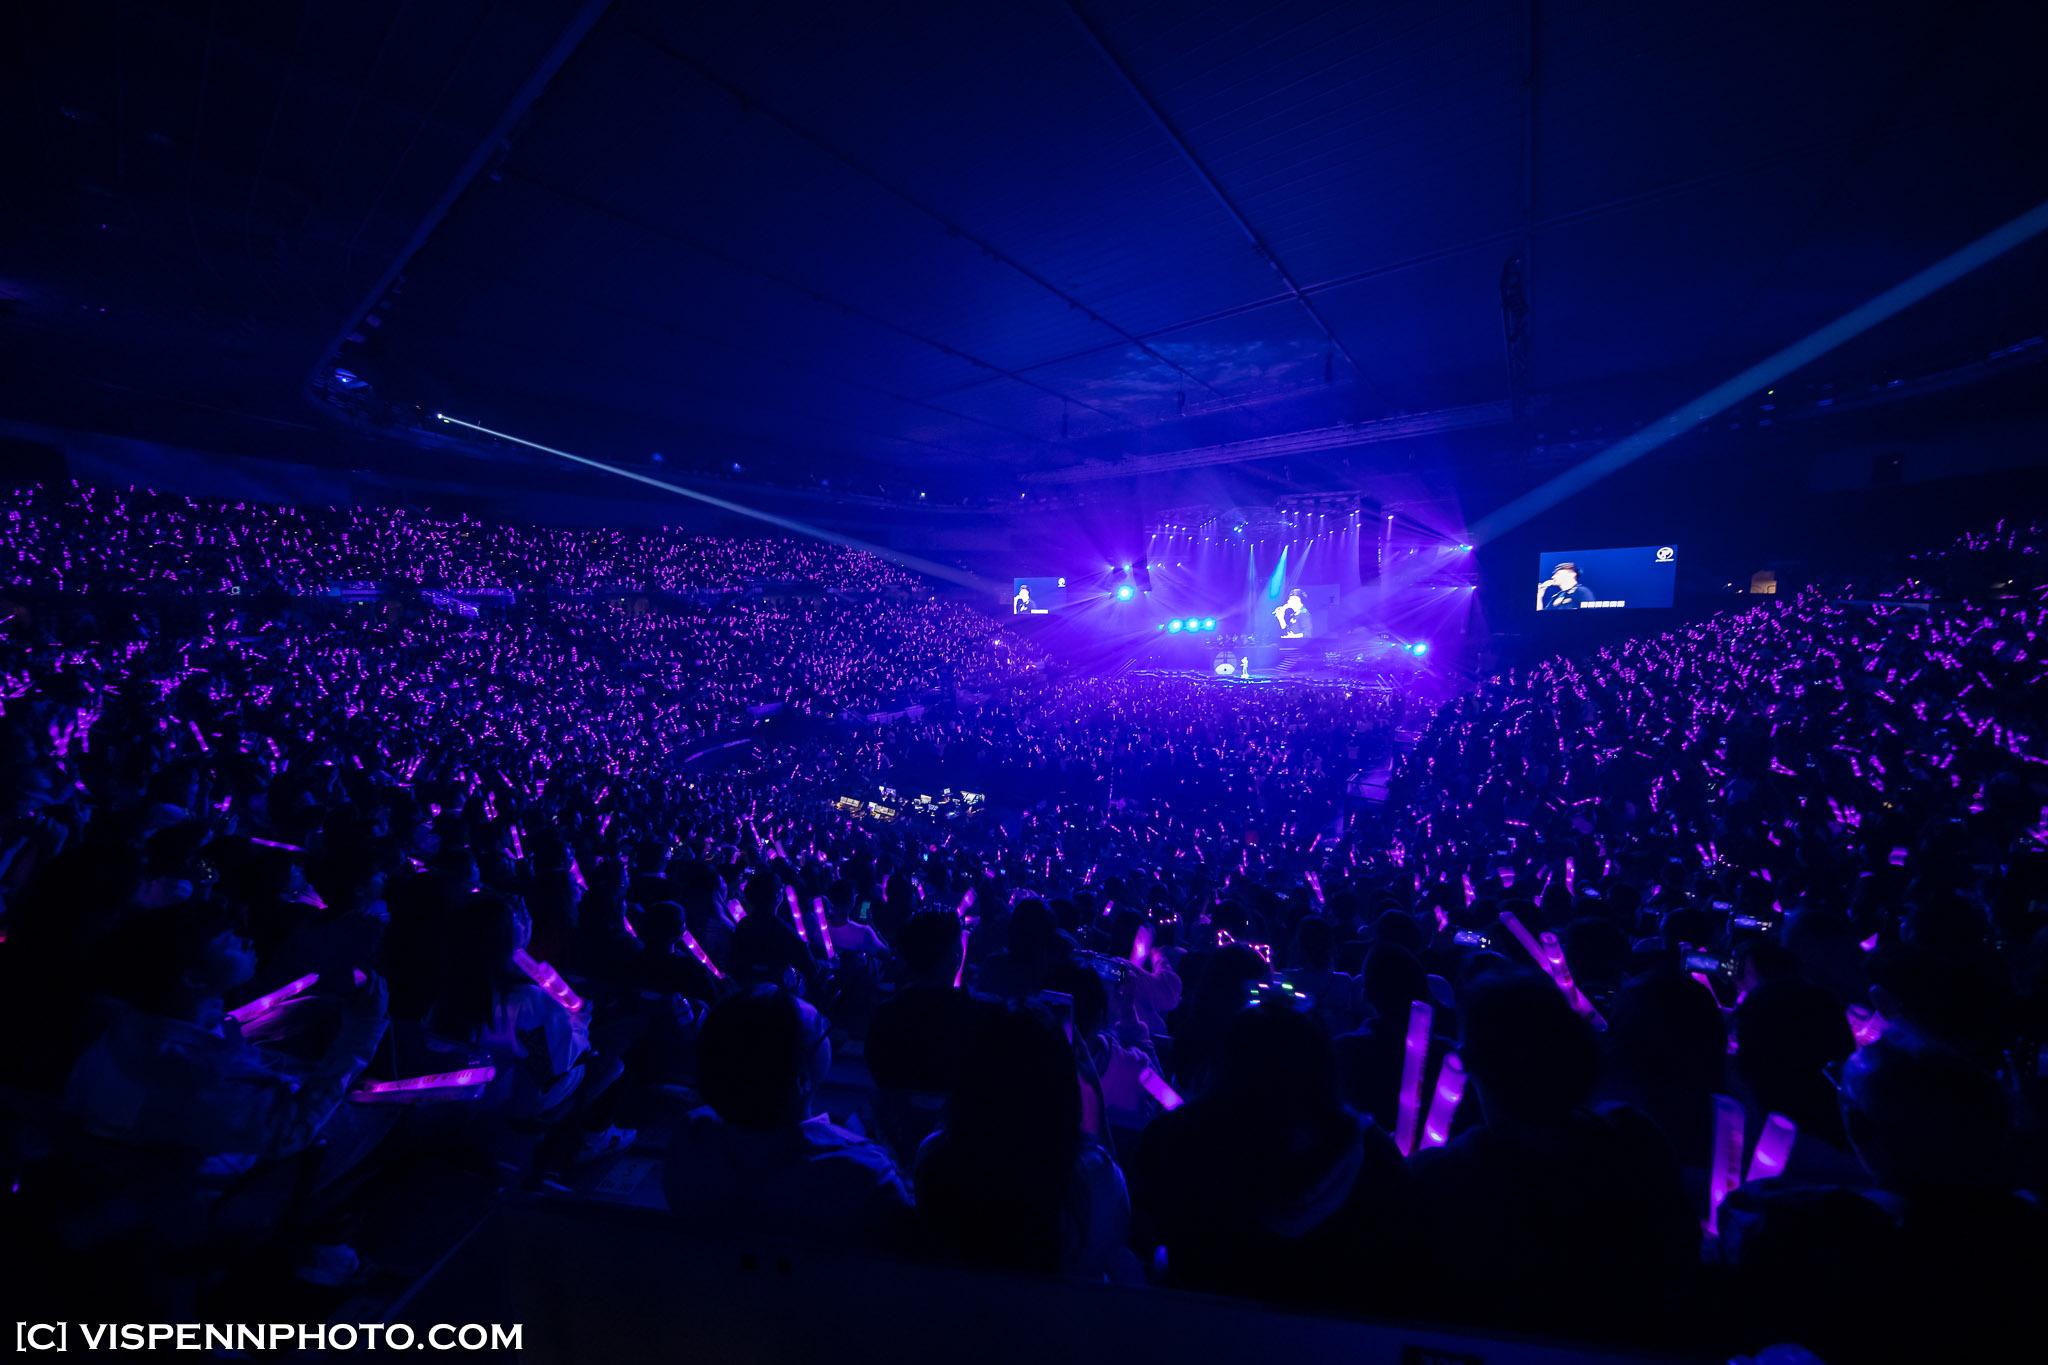 Melbourne CONCERTS Photography 墨尔本 演唱会 照片 摄影师 VISPENN JJLin 4208 5D4 VISPENN